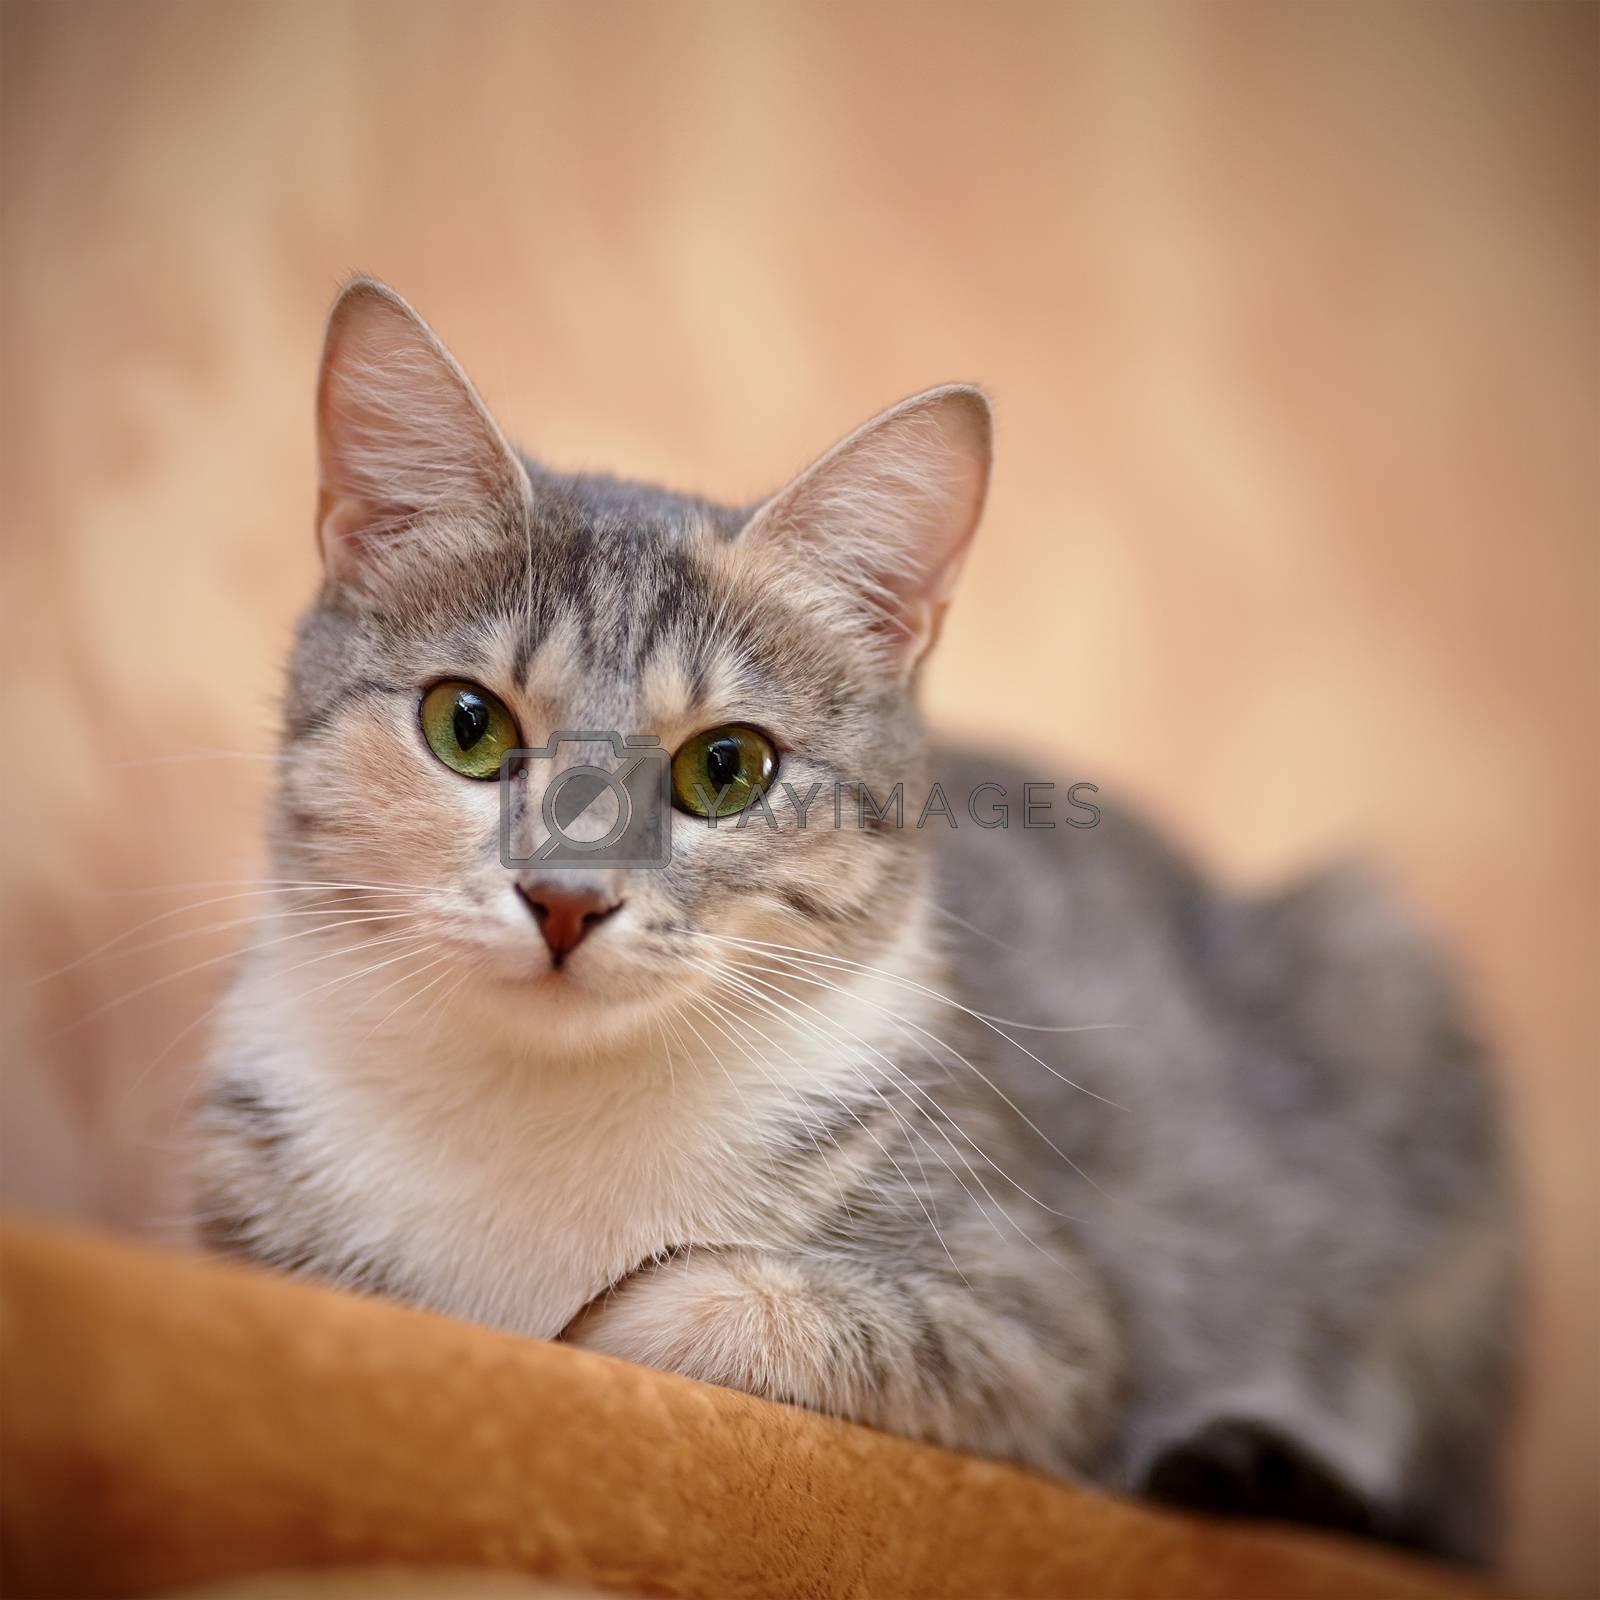 Royalty free image of Gray cat with green eyes. by Azaliya